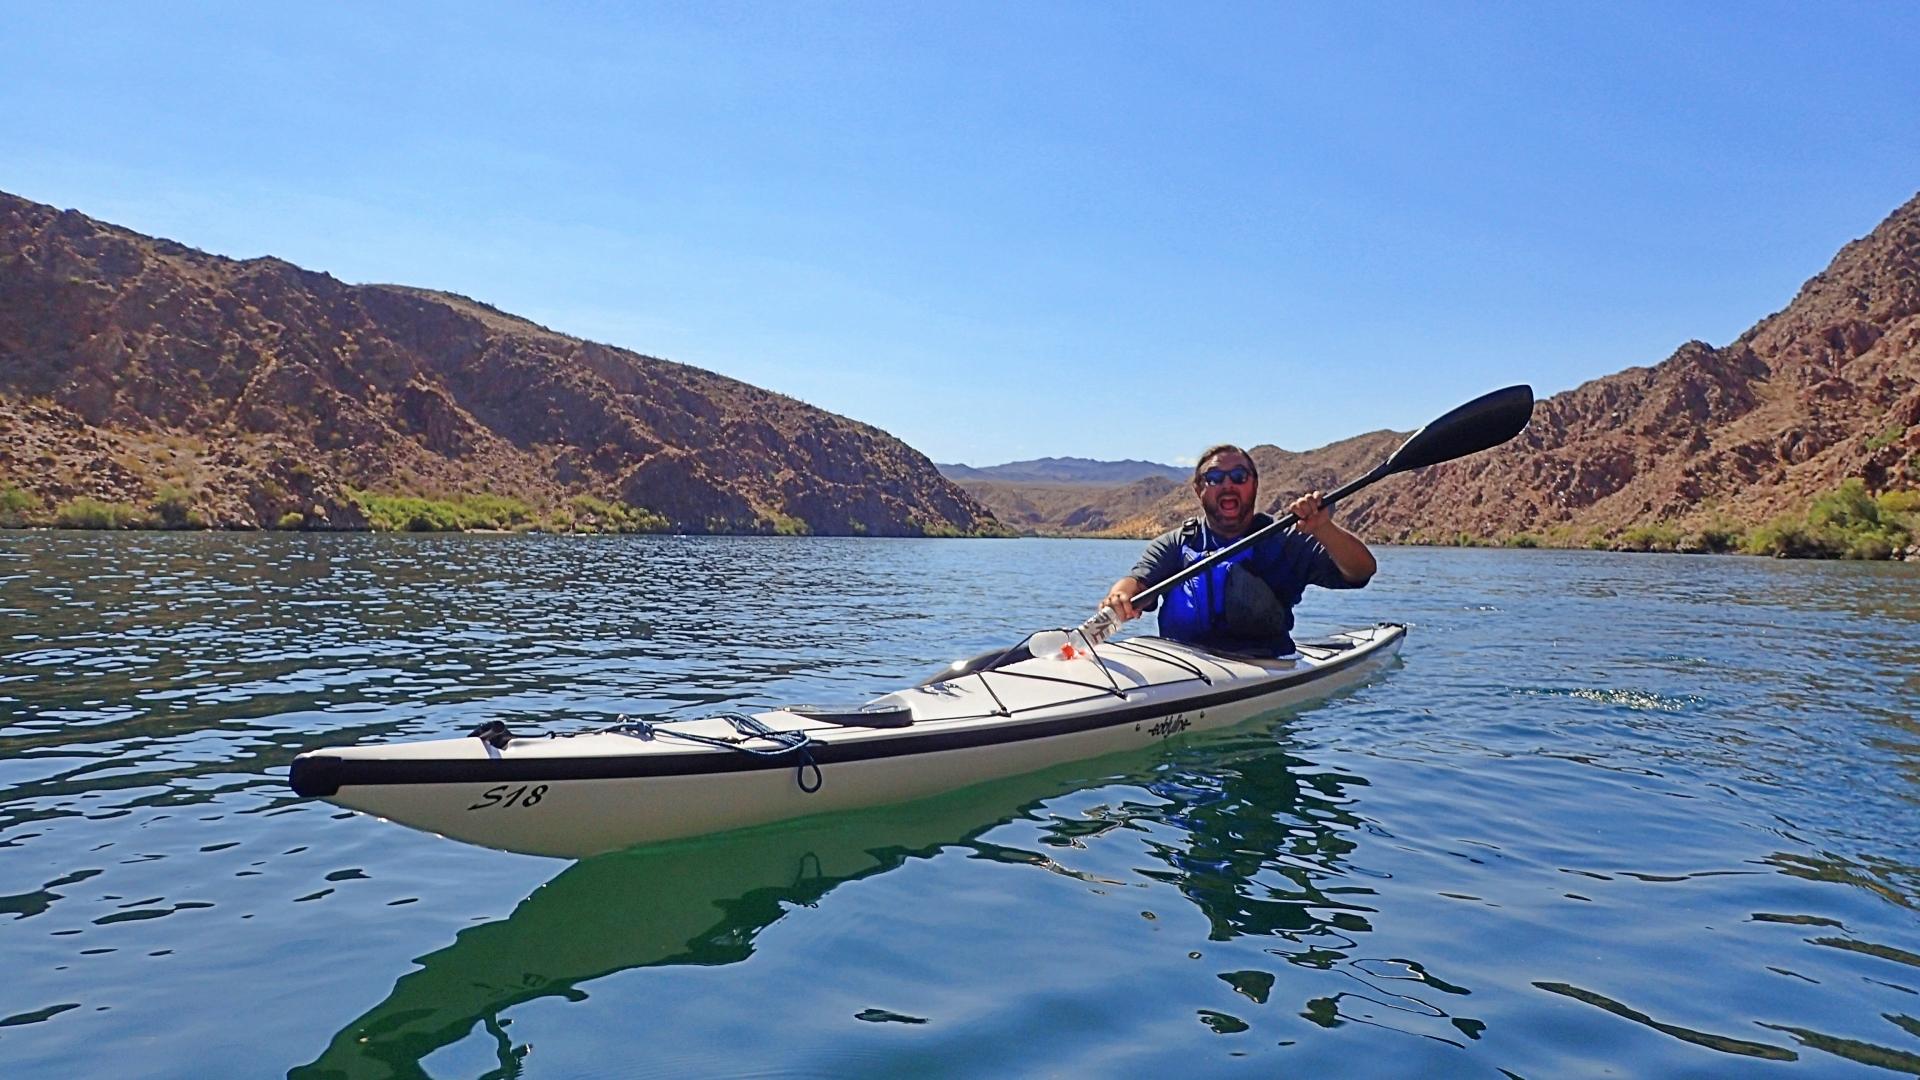 Morgan Eisen in an Eddyline Falcon Lake Mohave